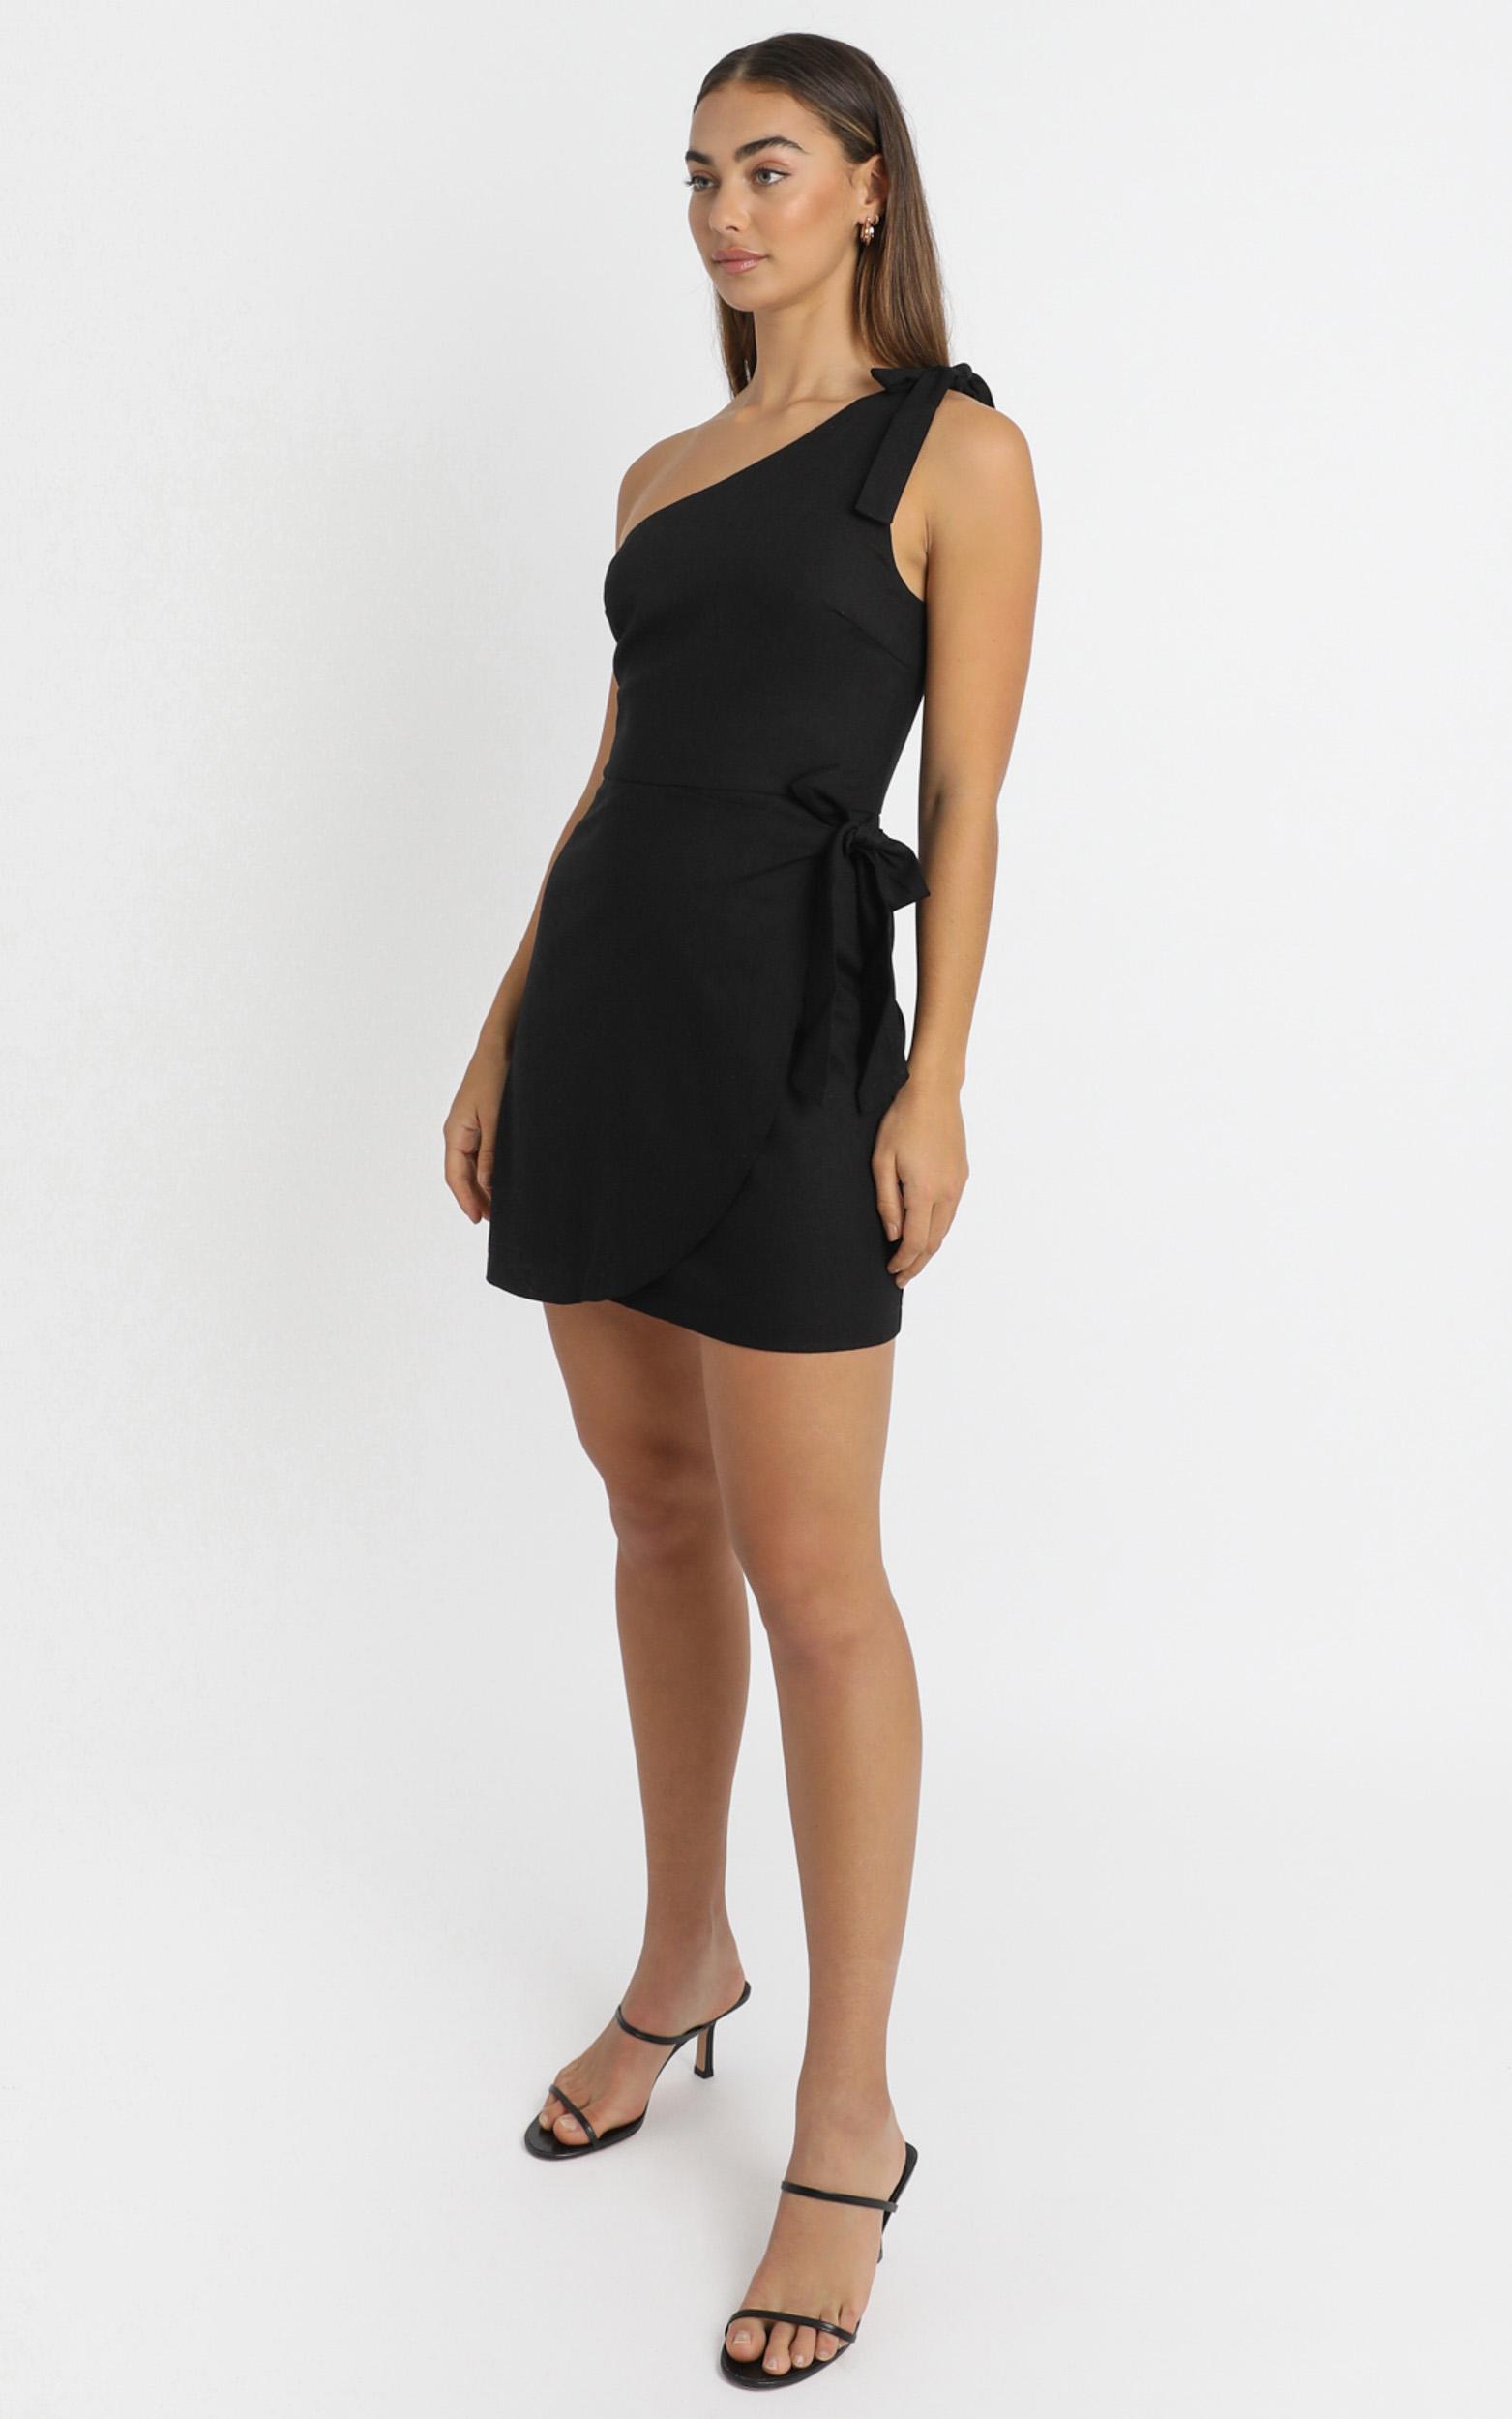 Keeping It Together Dress in black - 20 (XXXXL), Black, hi-res image number null